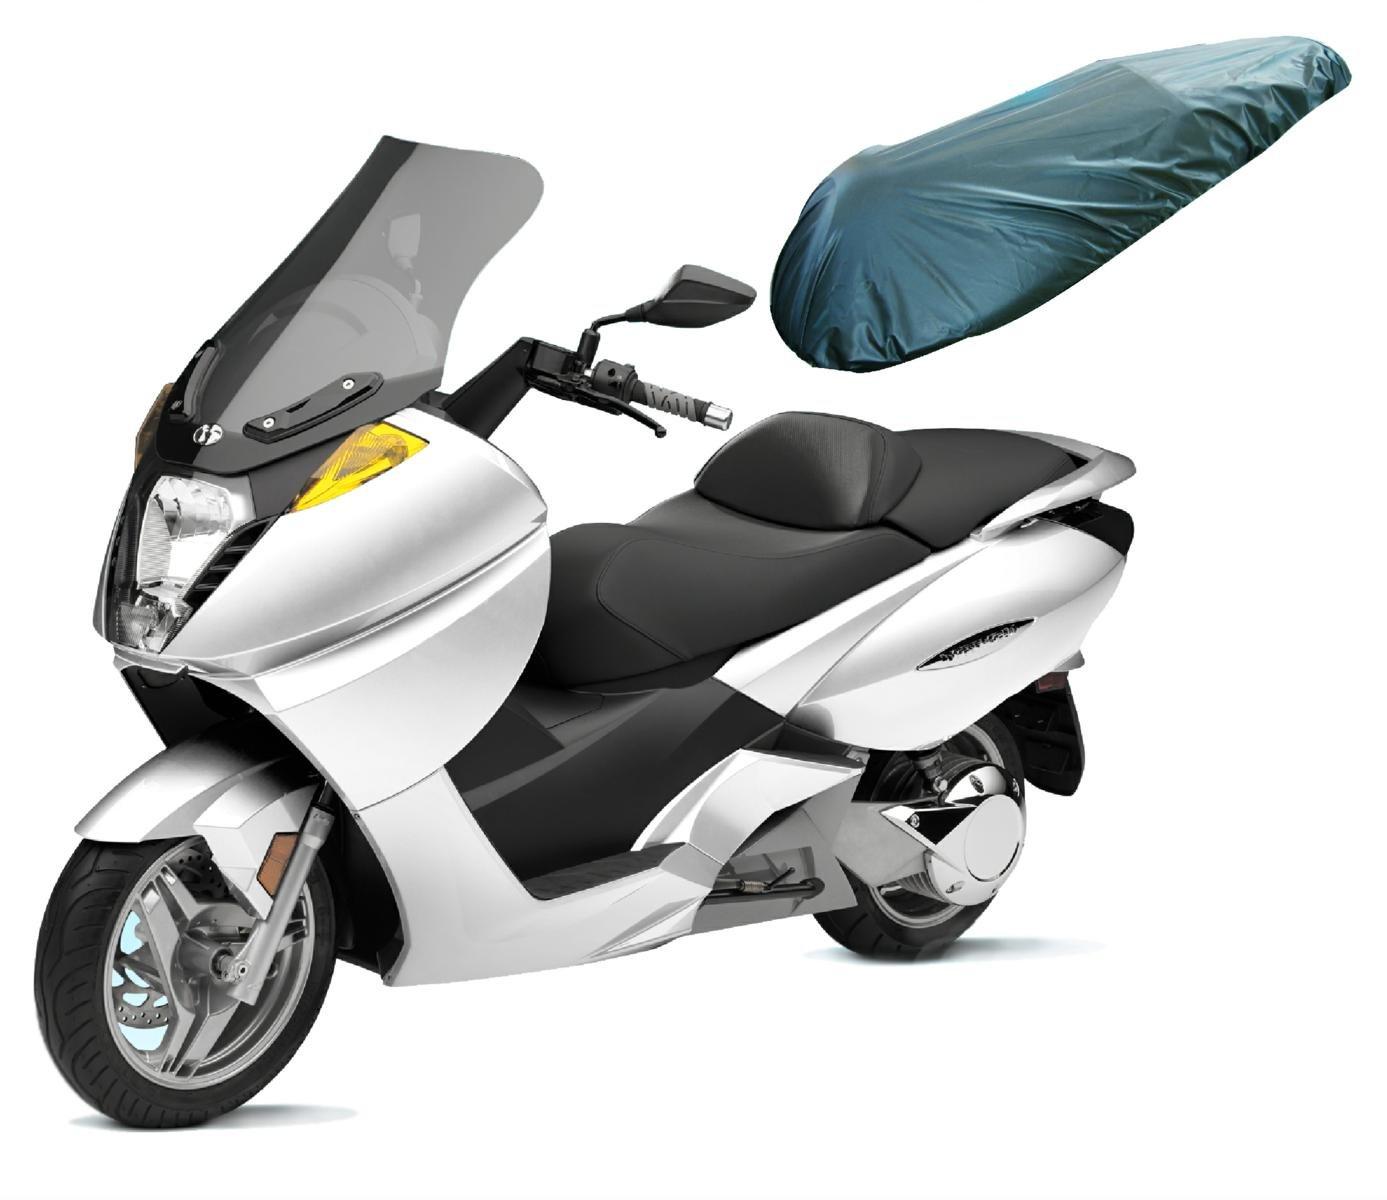 A-pro Universal Motorcycle Motorbike Nylon Heavy Duty Waterproof Seat Covers Black L